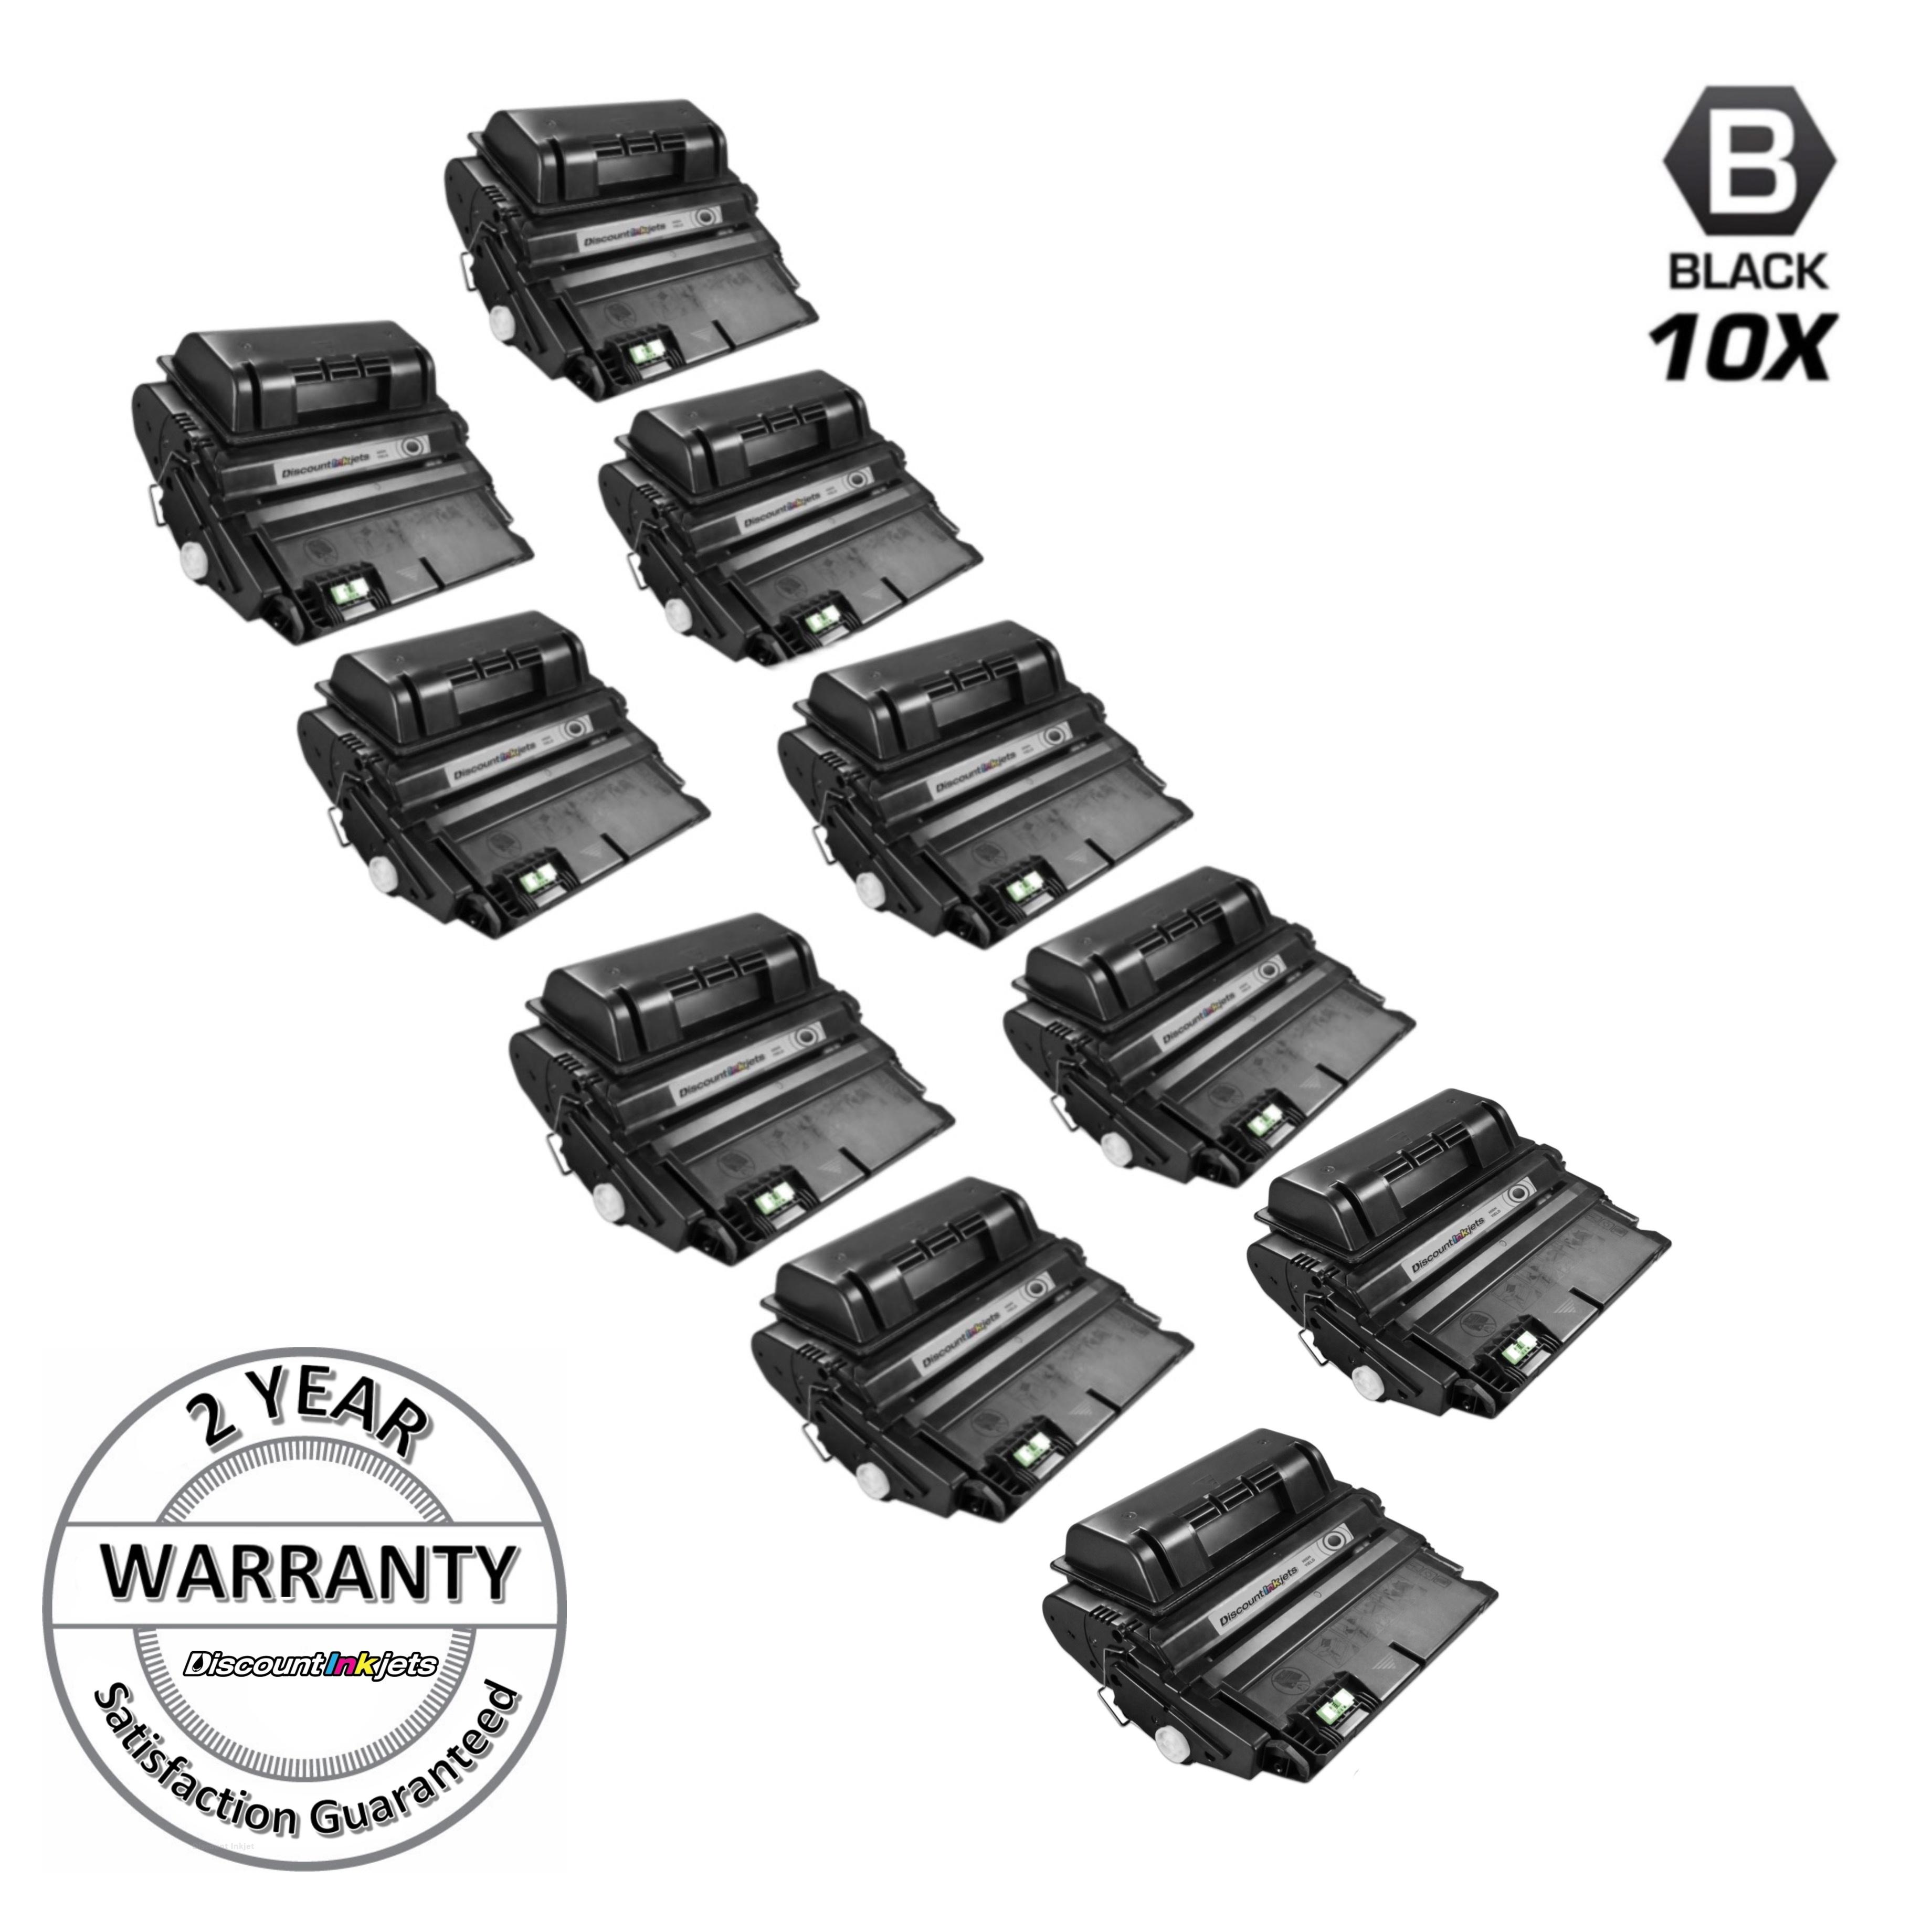 3PK Q5942A 42A Black Toner Cartridge For HP LaserJet 4250 4350tn 4350Dtnsl 4250n